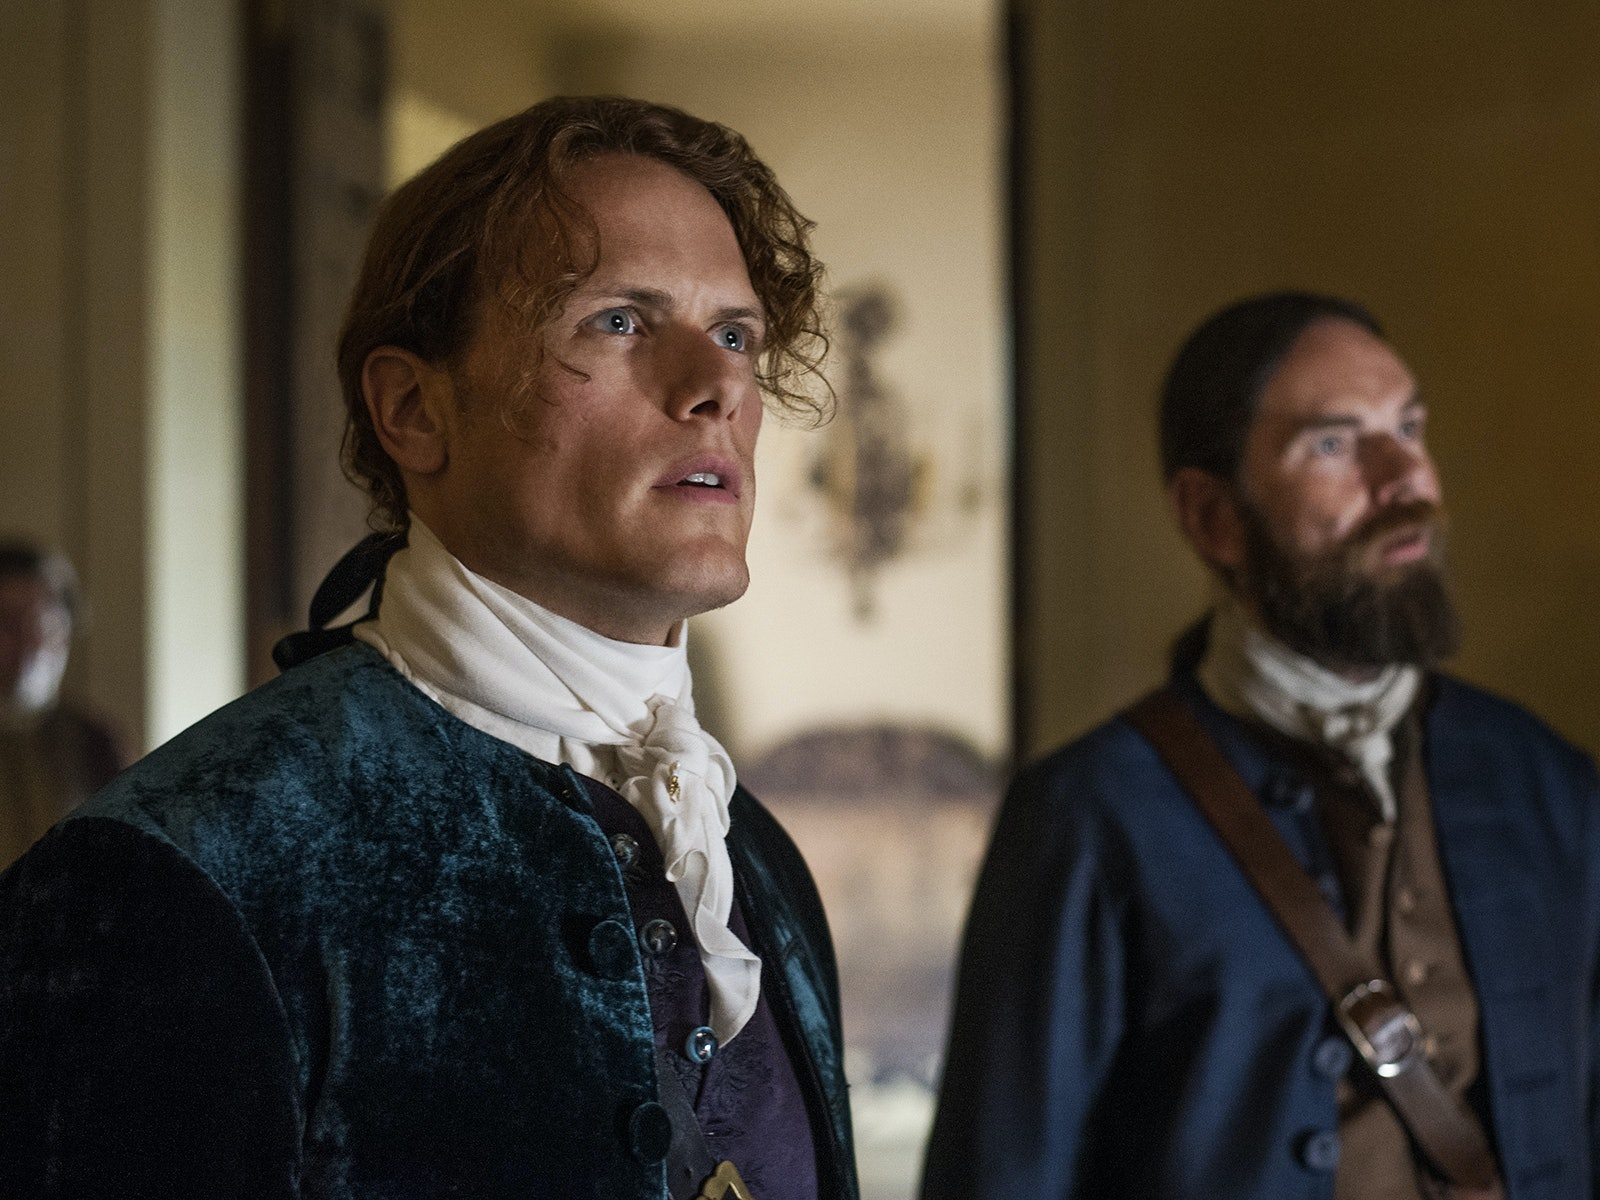 'Outlander' Season 2 Explores the Zany Humor of 1700s France